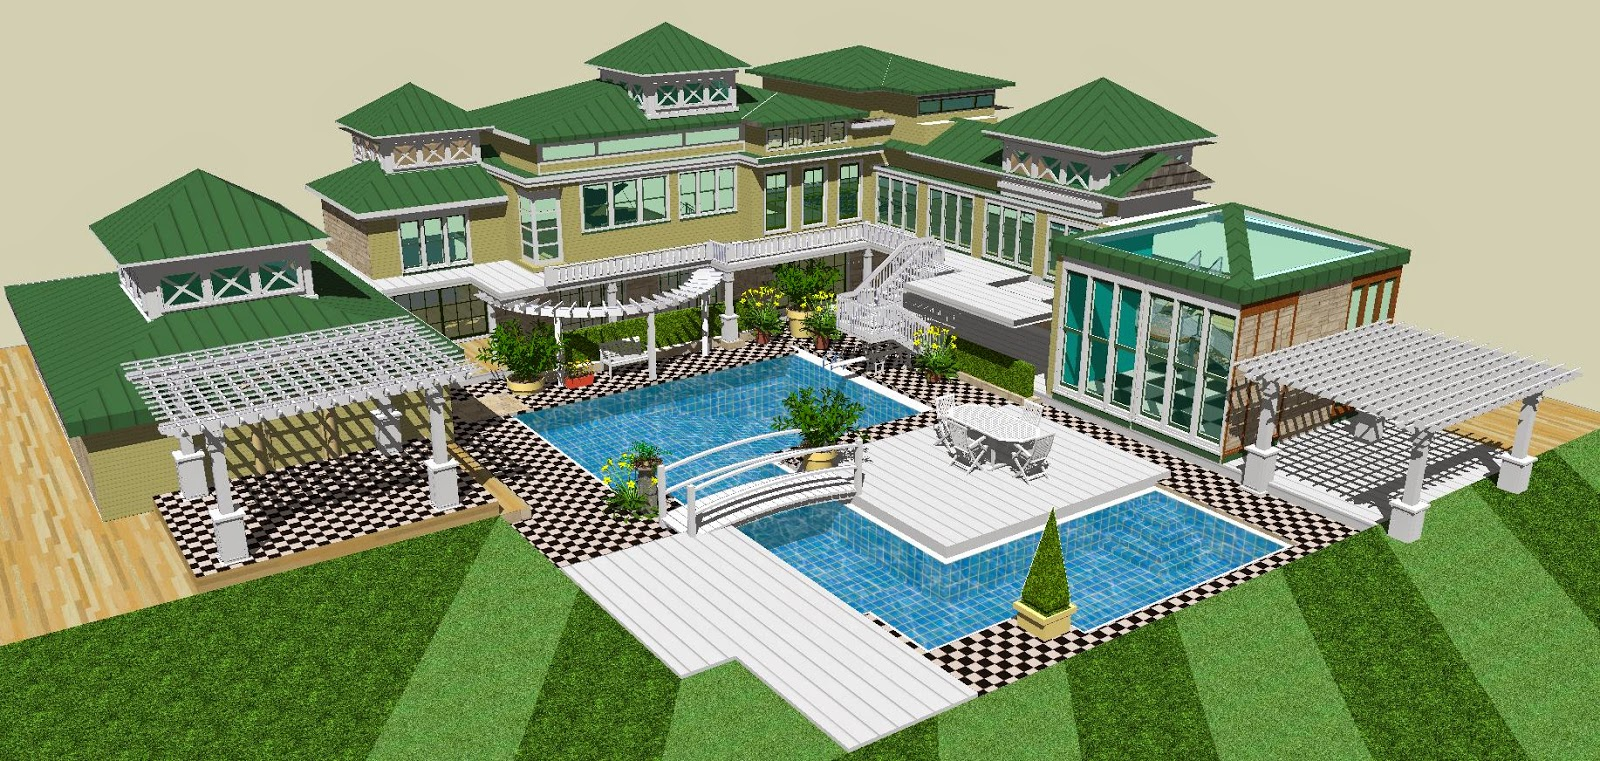 for Pool design sketchup